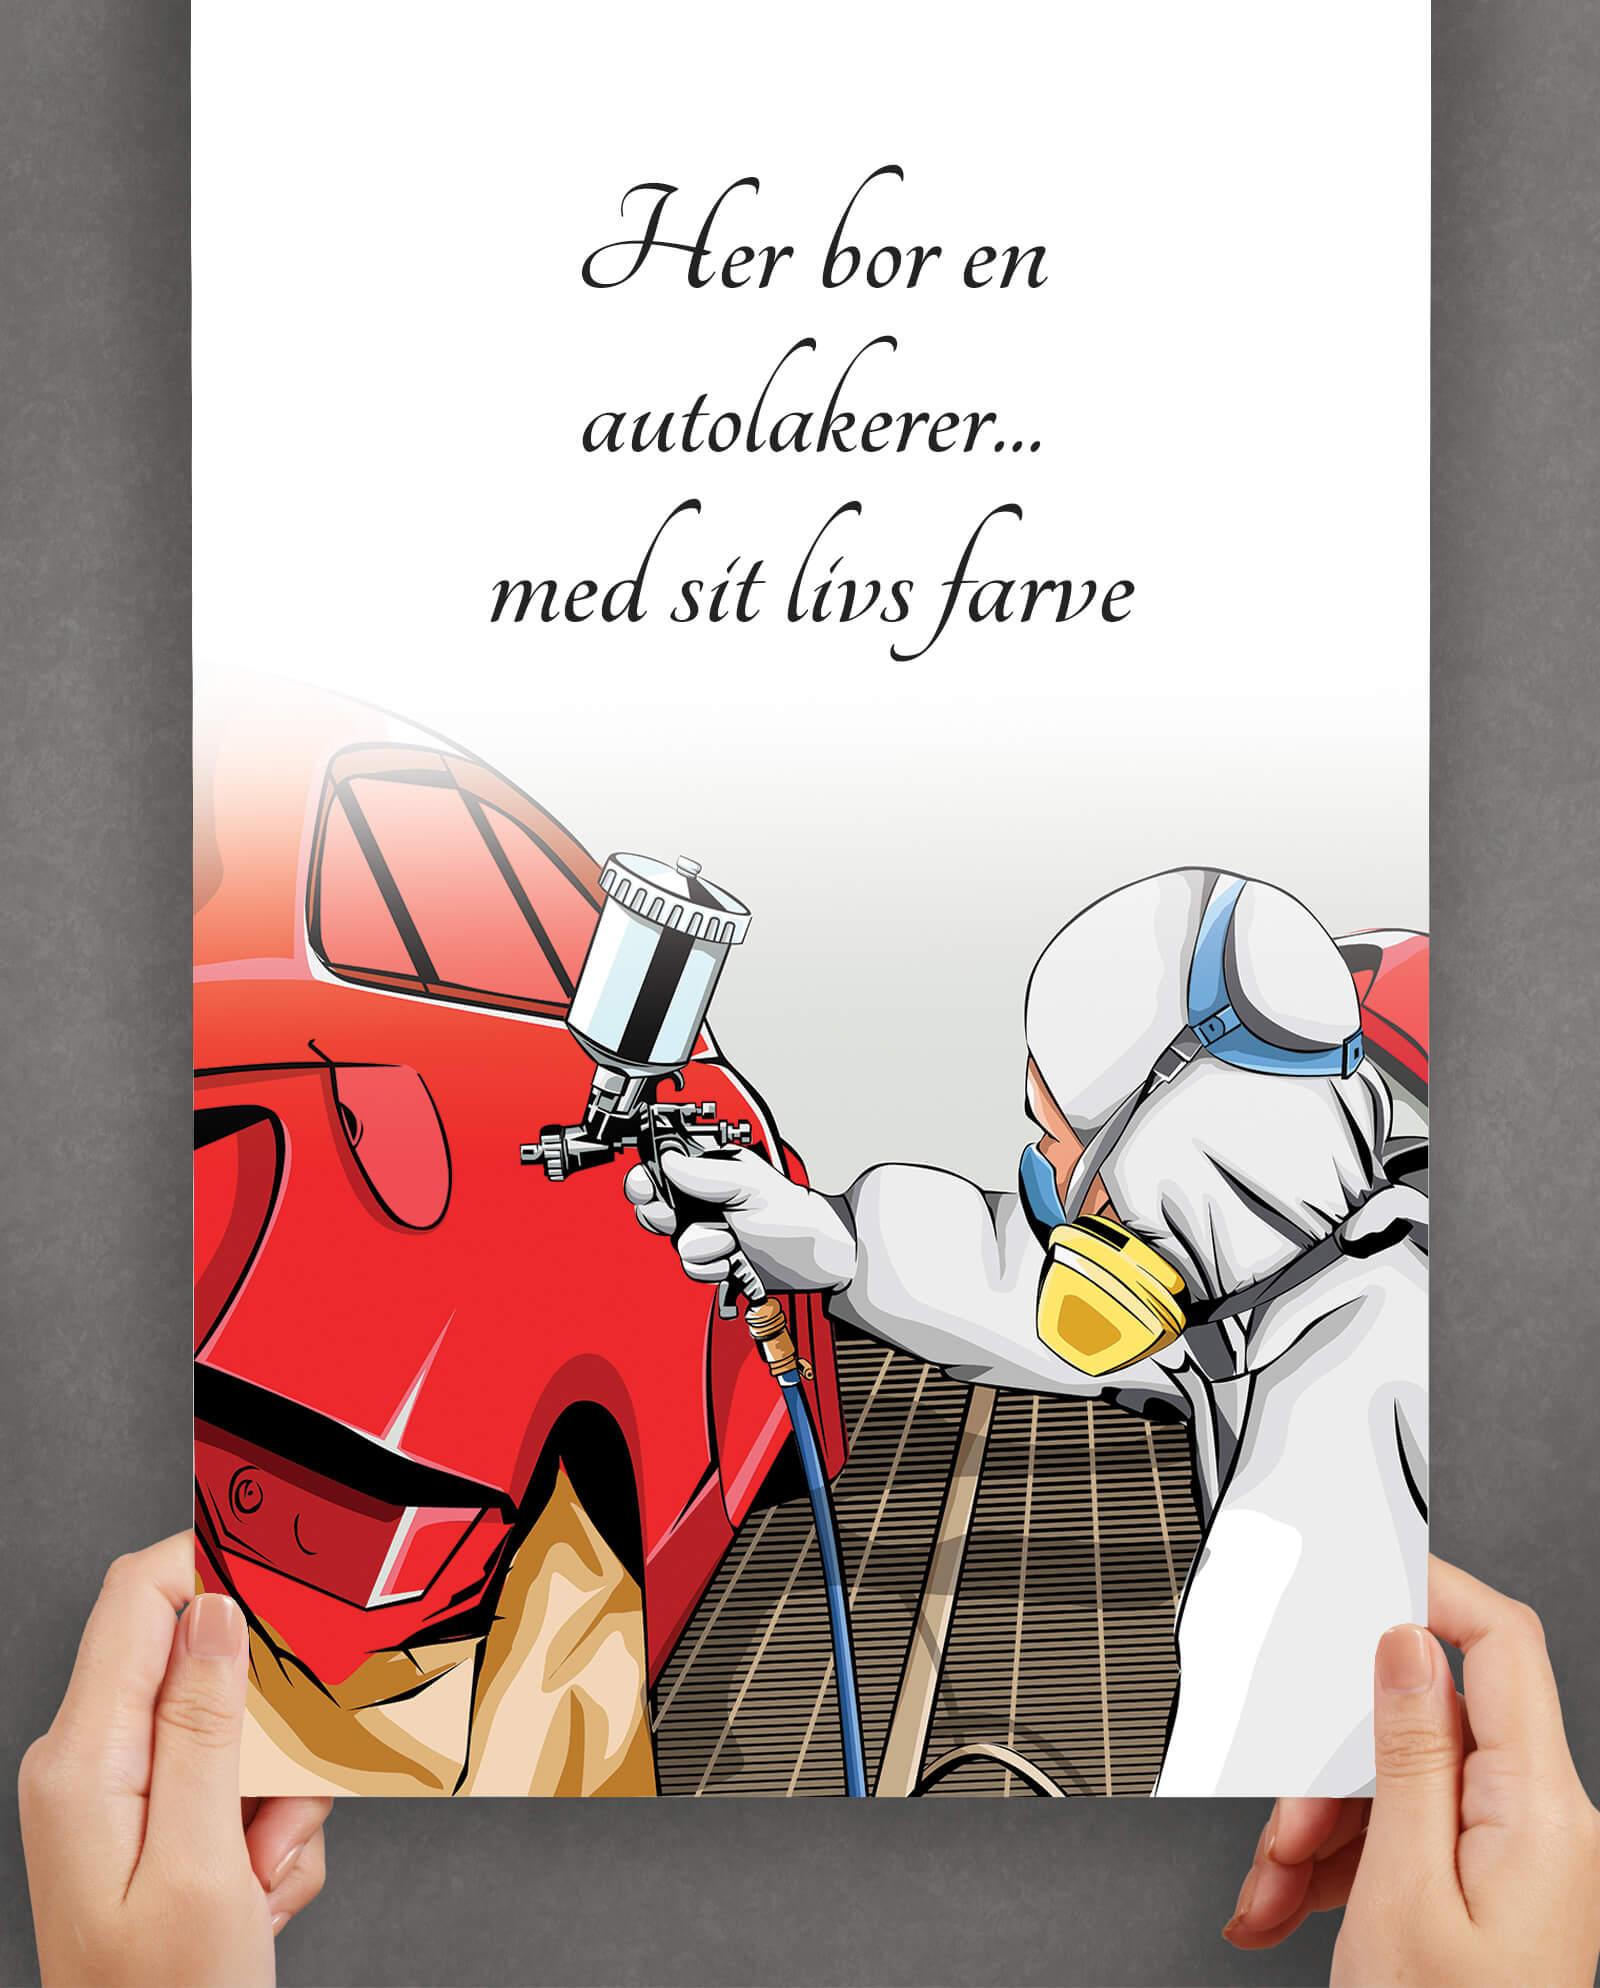 Autolakerer-plakat